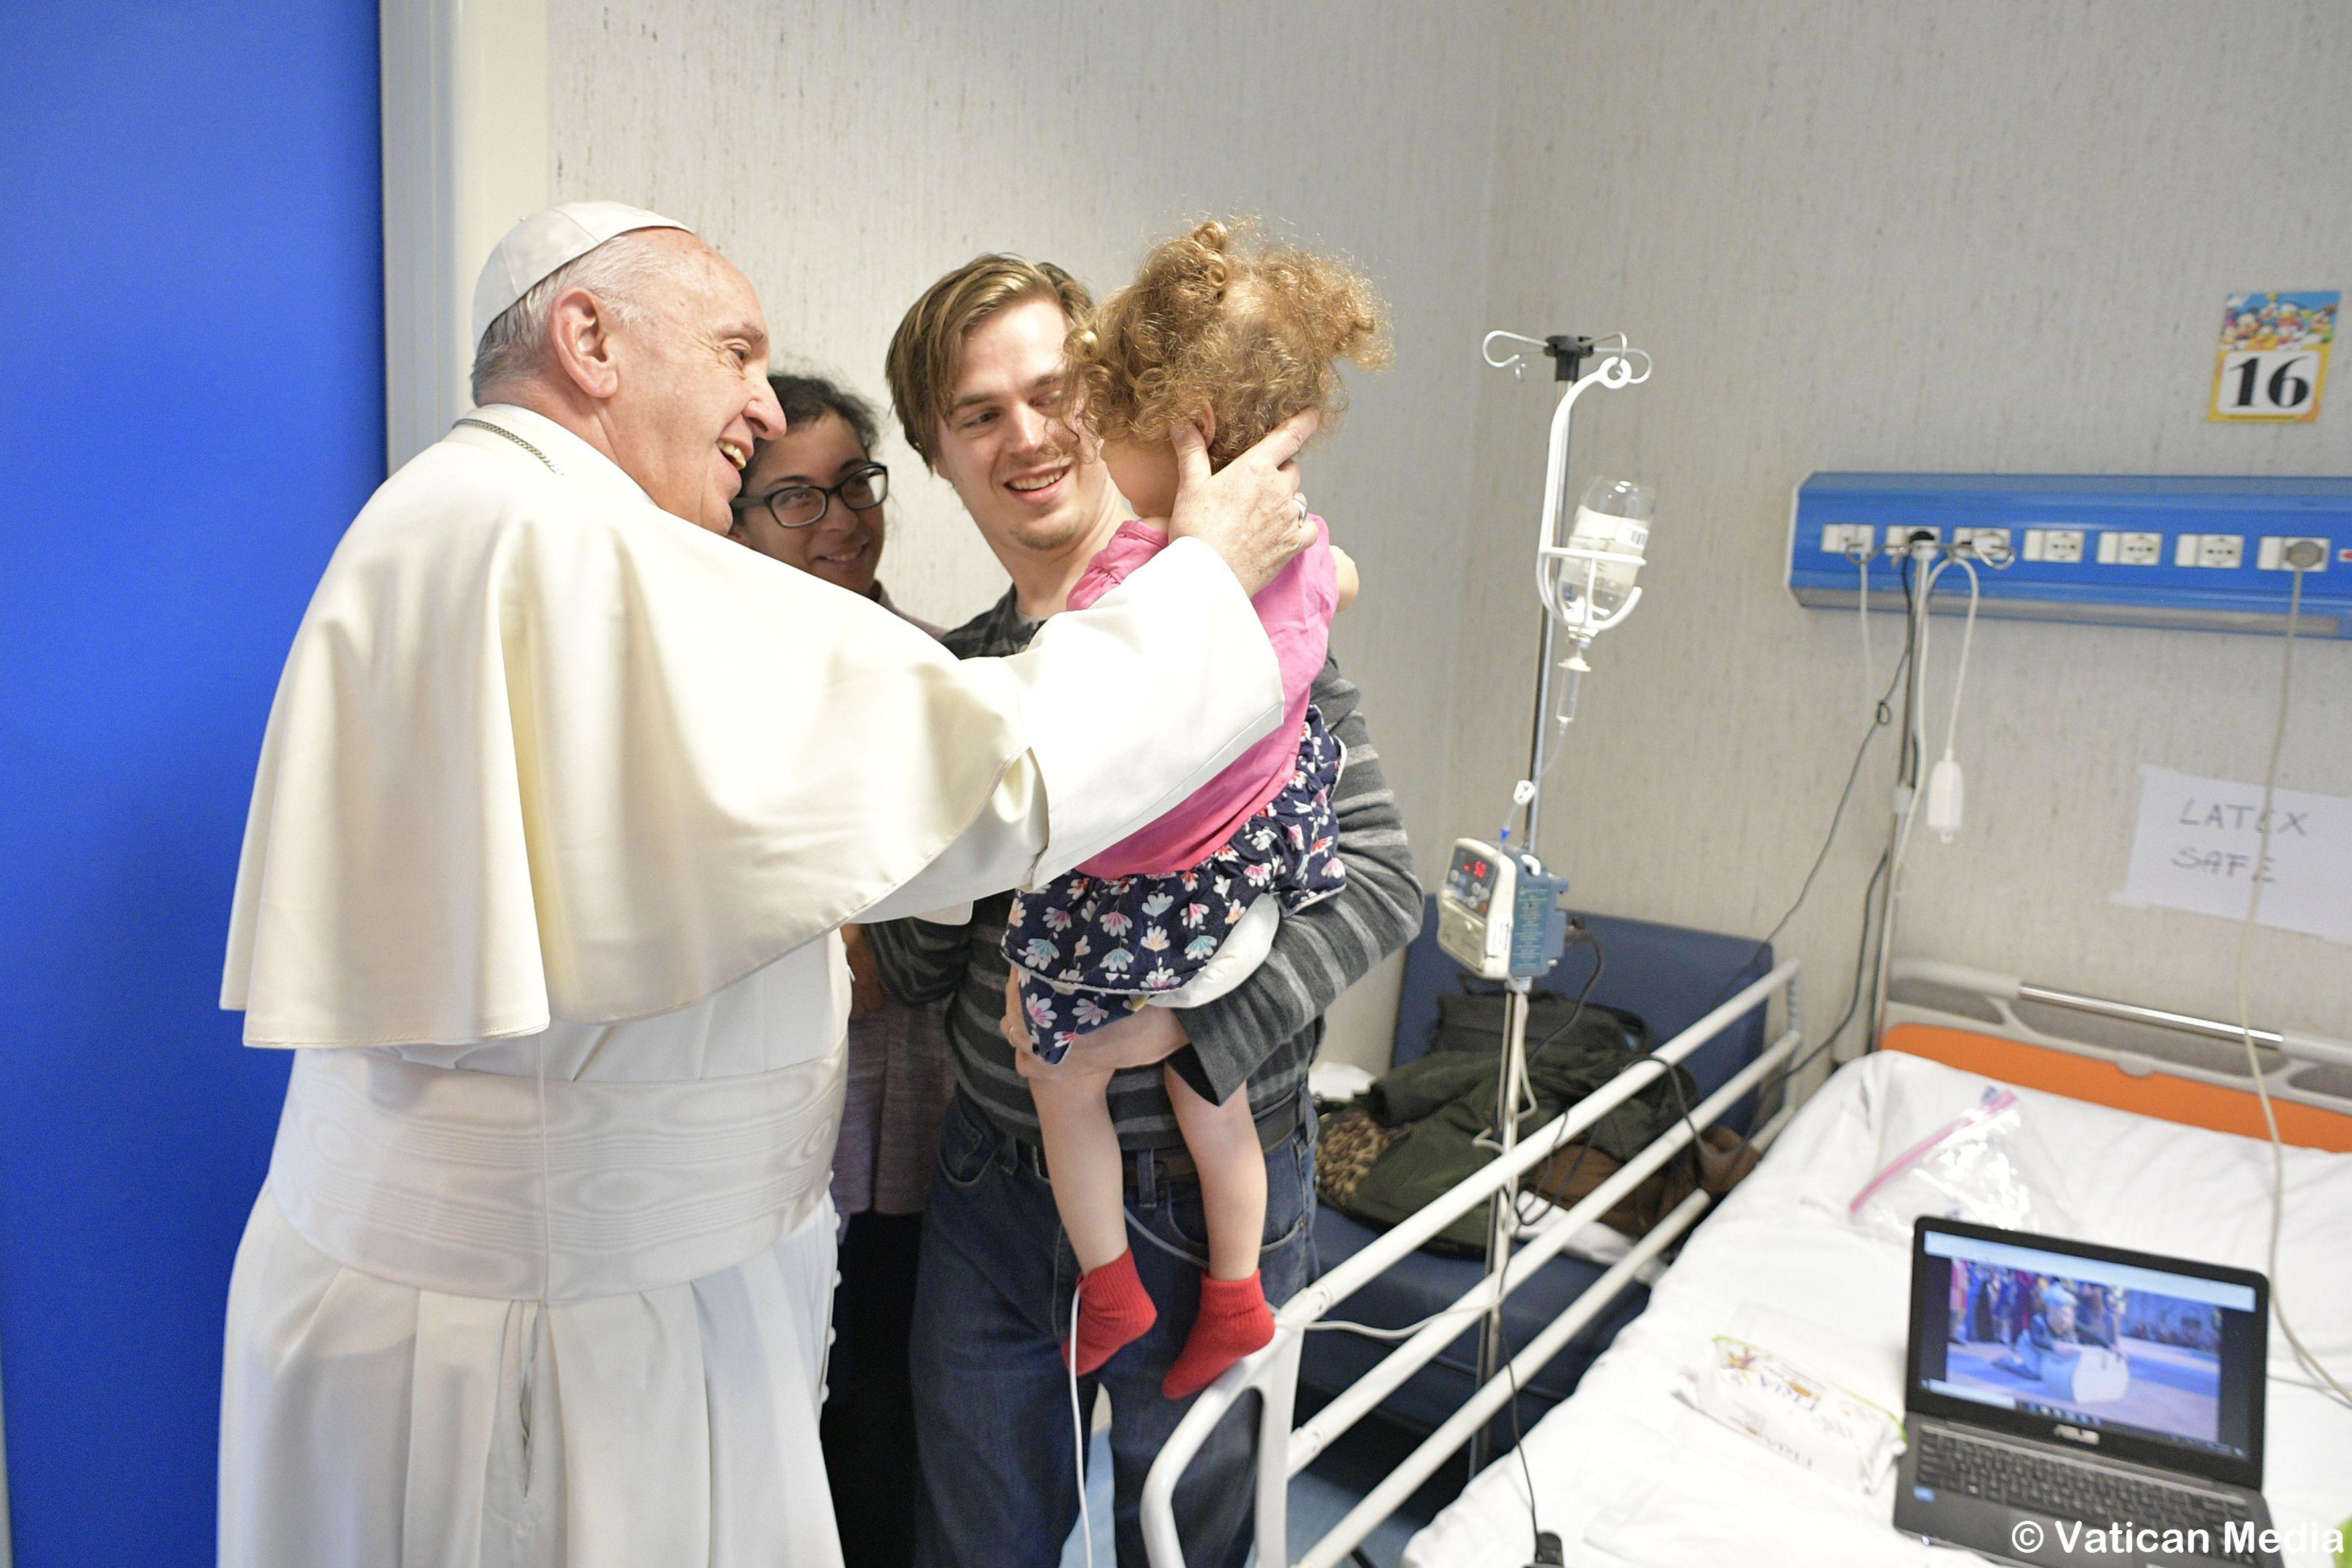 Bambino Gesu de Palidoro © Vatican News